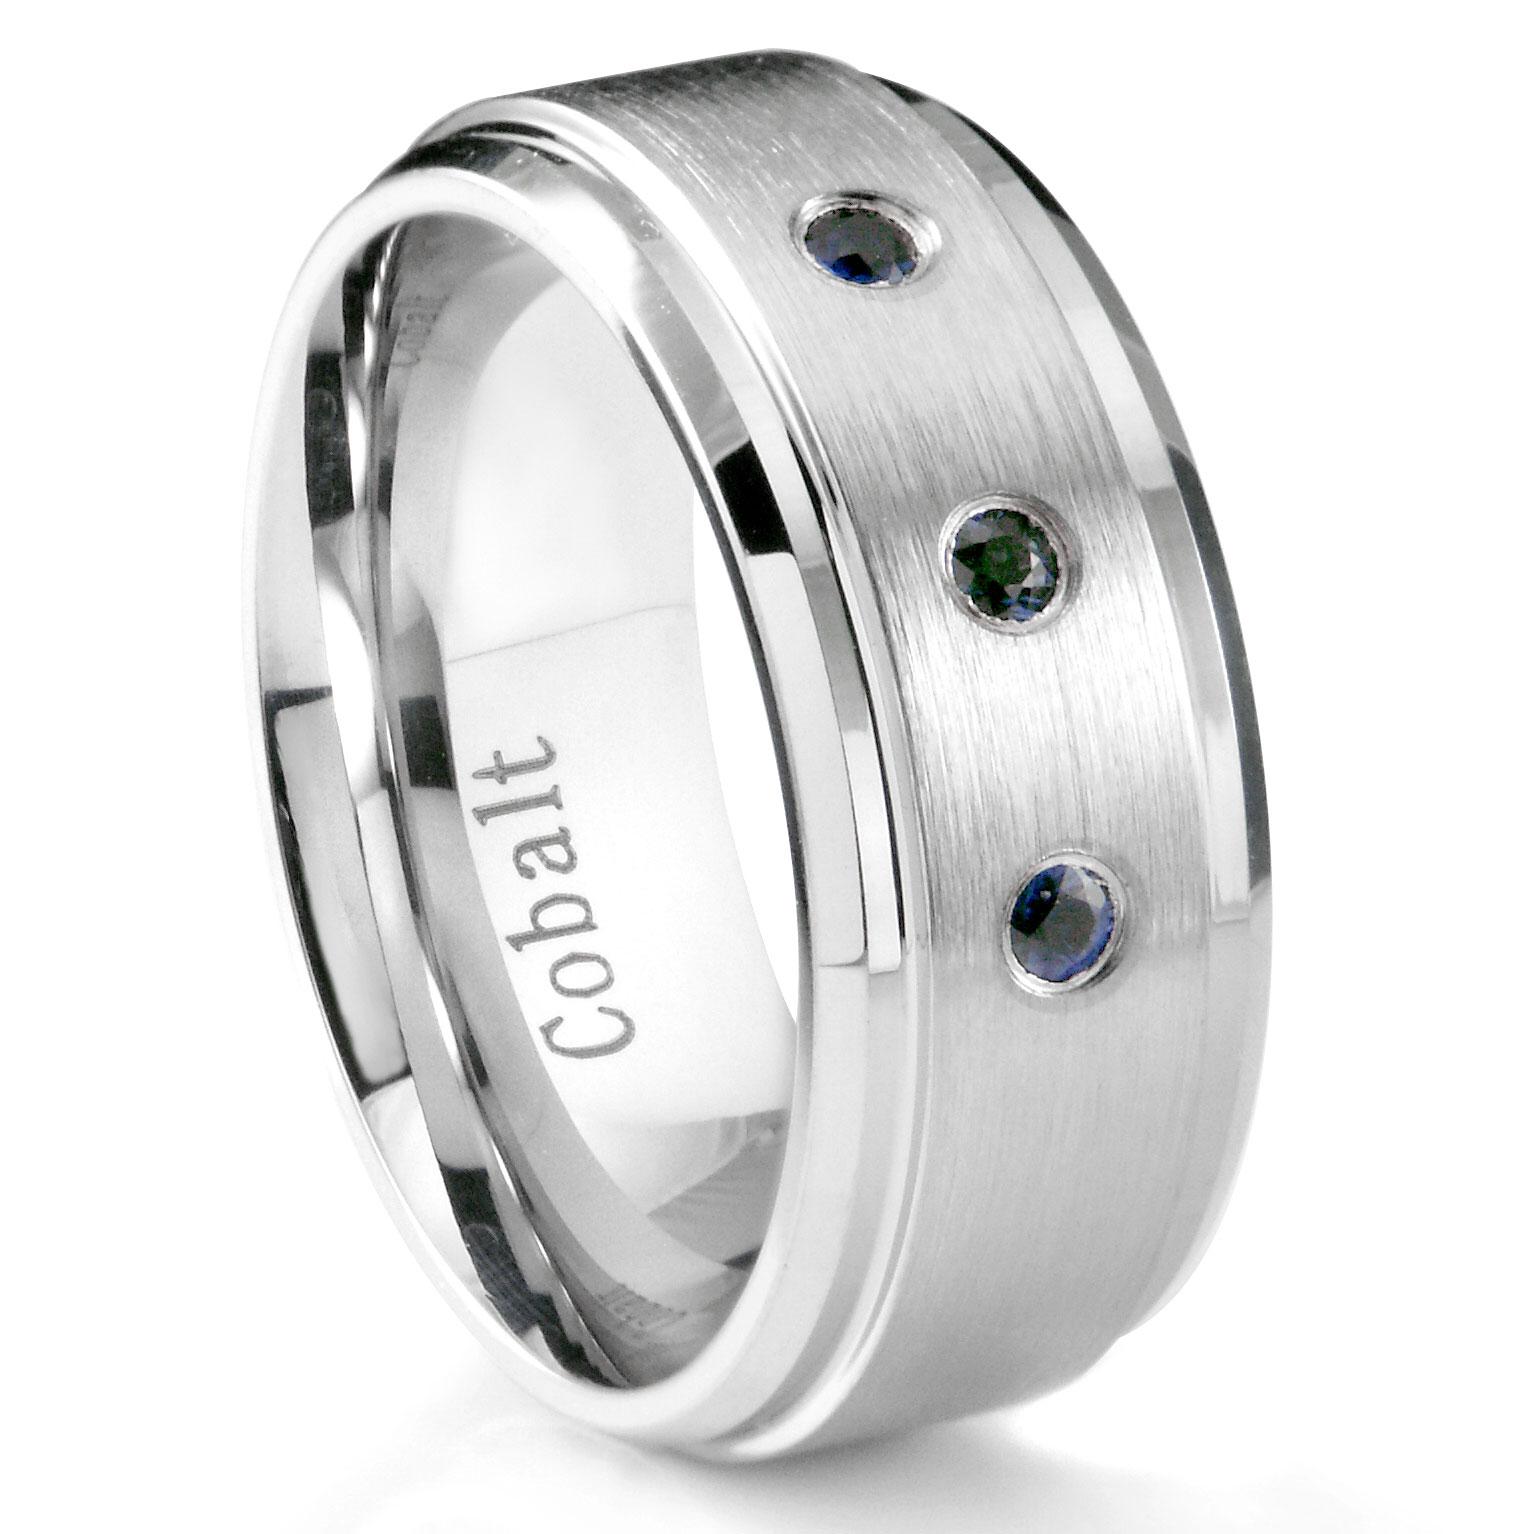 Cobalt Chrome 8MM 3 Blue Sapphire Wedding Band Ring w Stepped Edges P sapphire wedding band Loading zoom